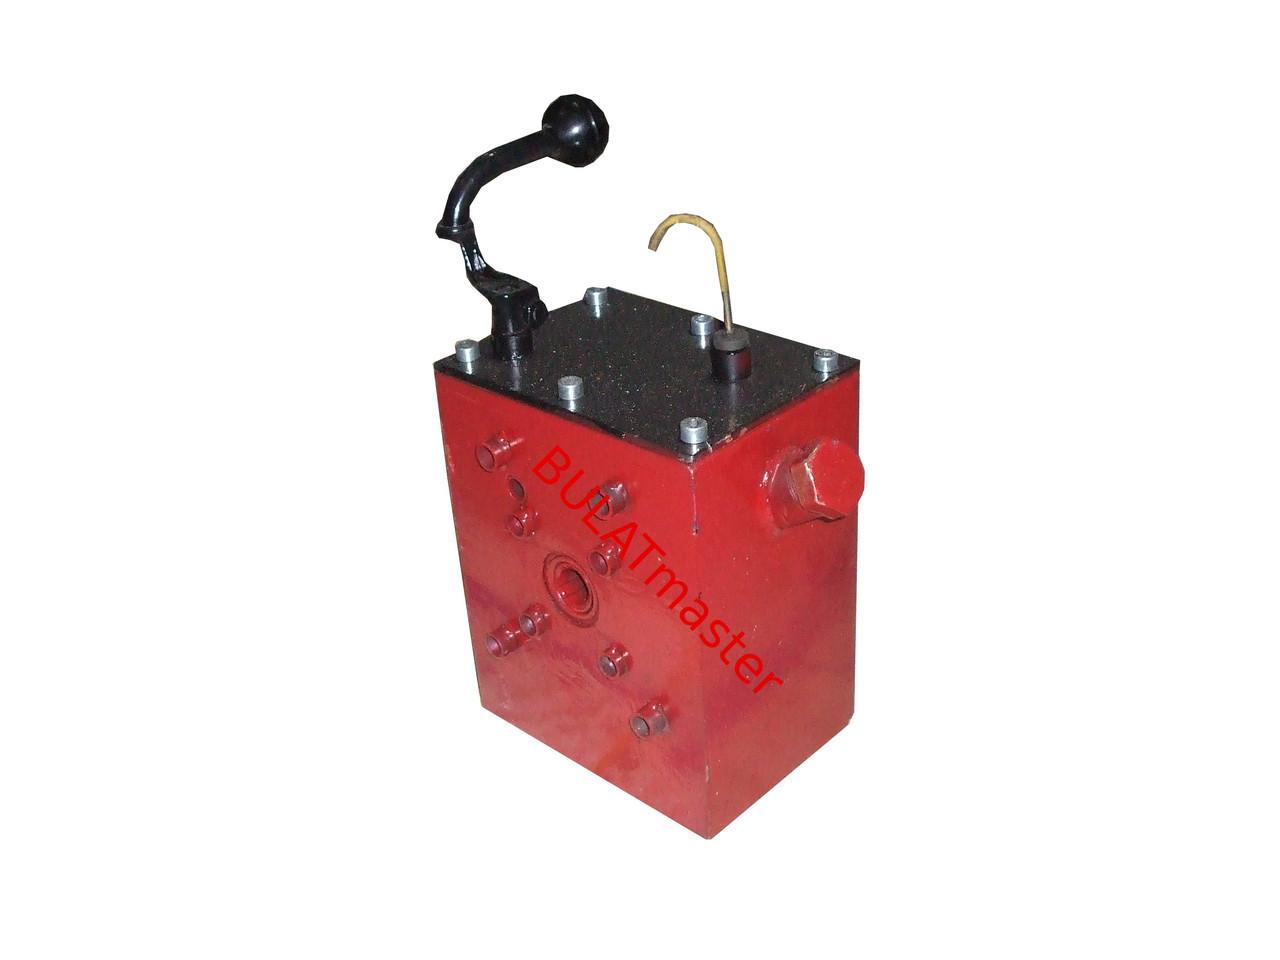 Ходоуменьшитель для мотоблока WM1100 (Зирка 105,135)Агромаркаok-2